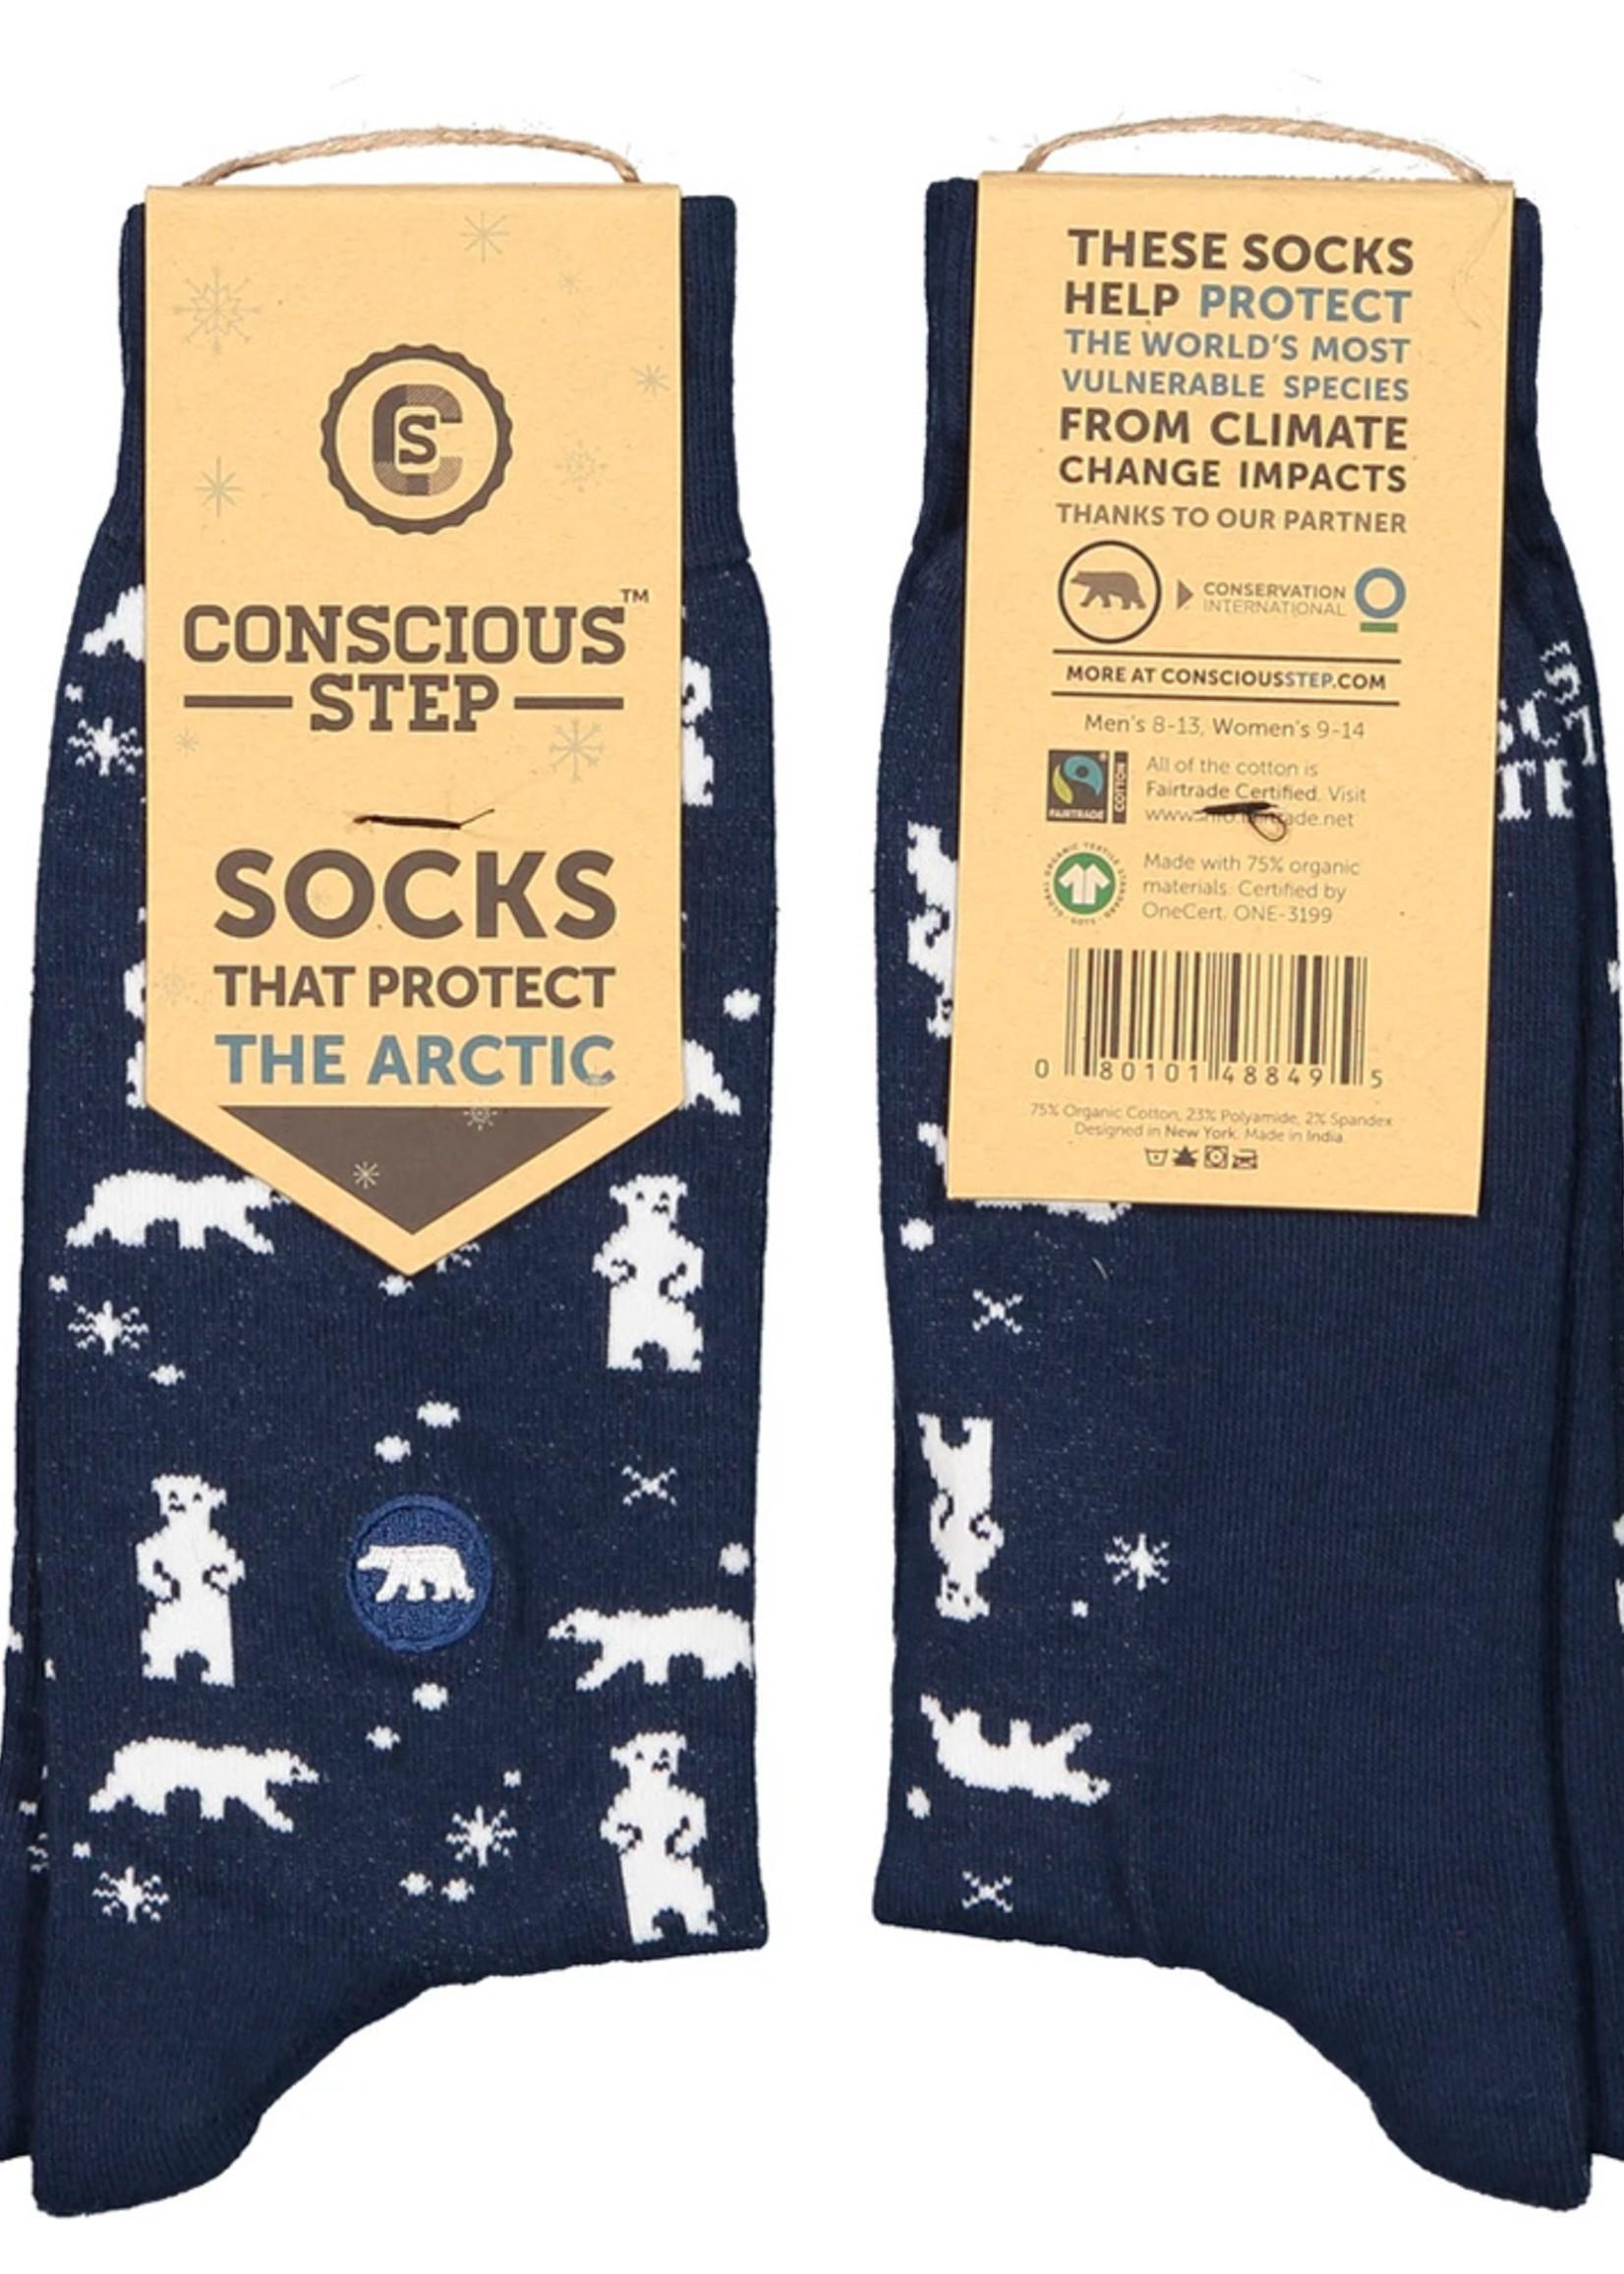 Socks That Protect the Arctic (men's)